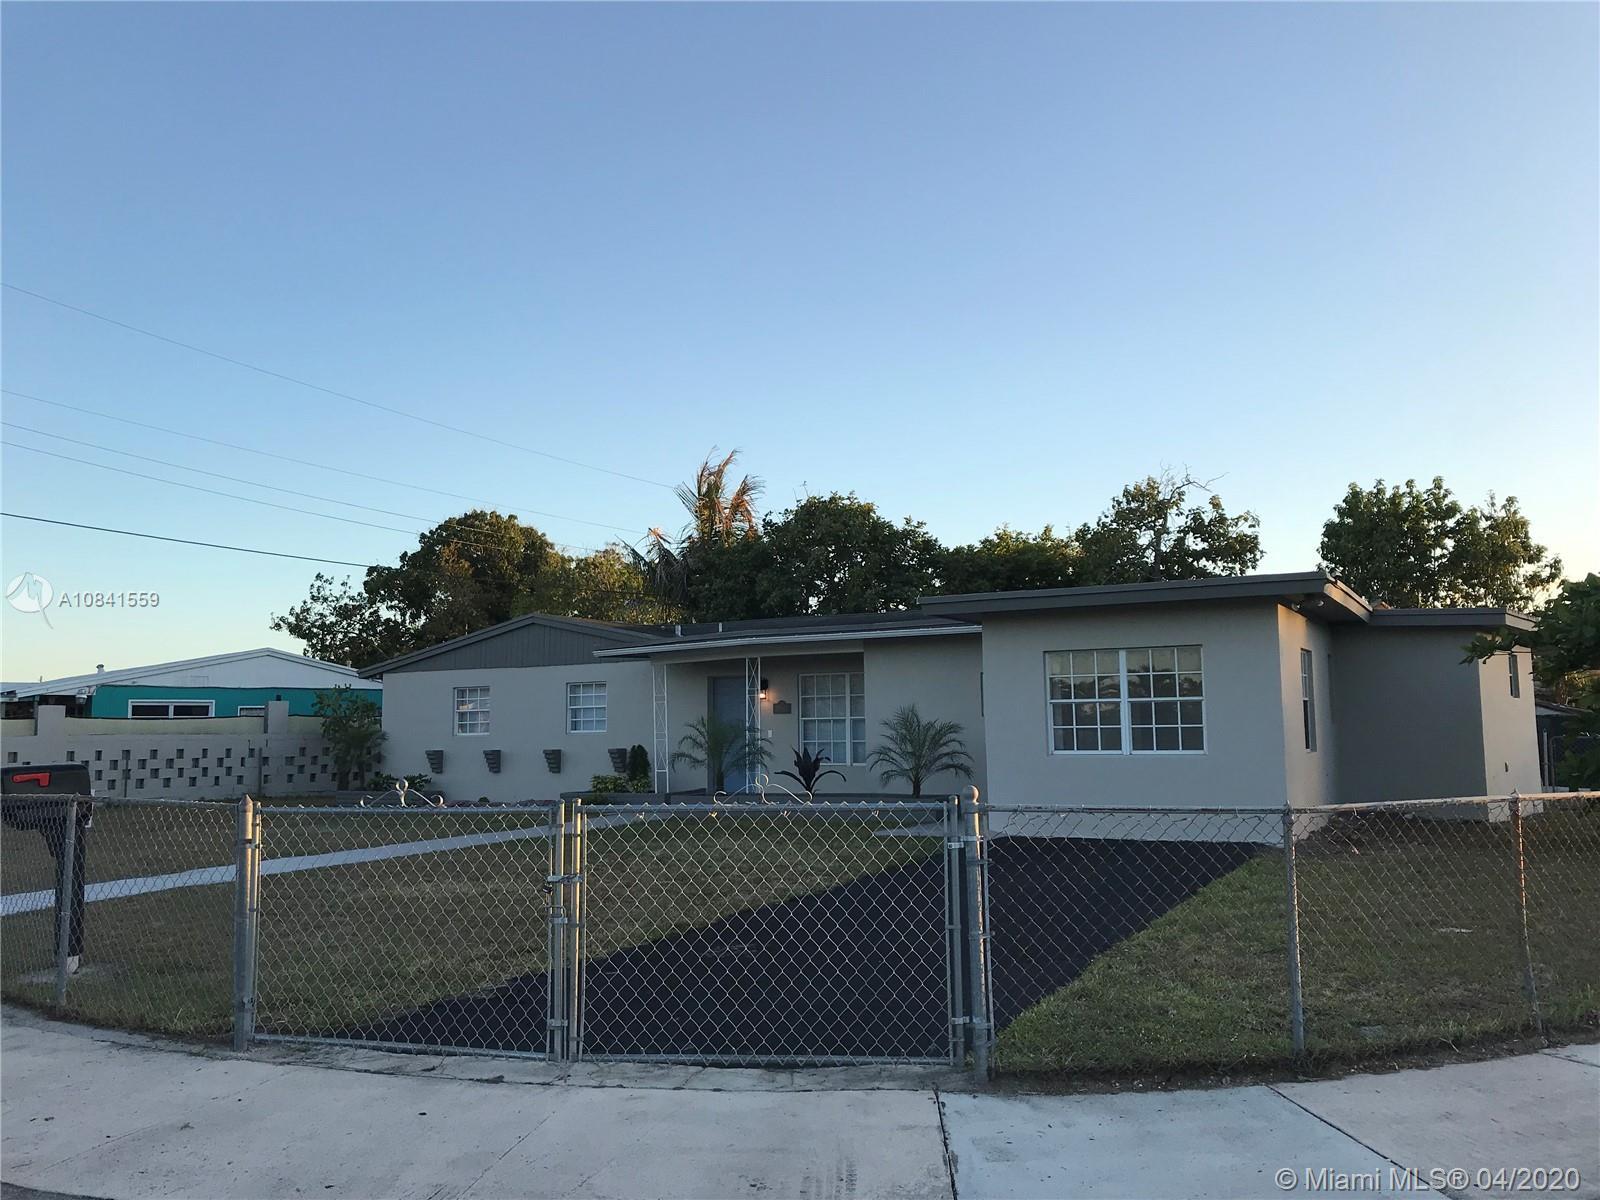 17240 NW 43rd Ave, Miami Gardens, FL 33055